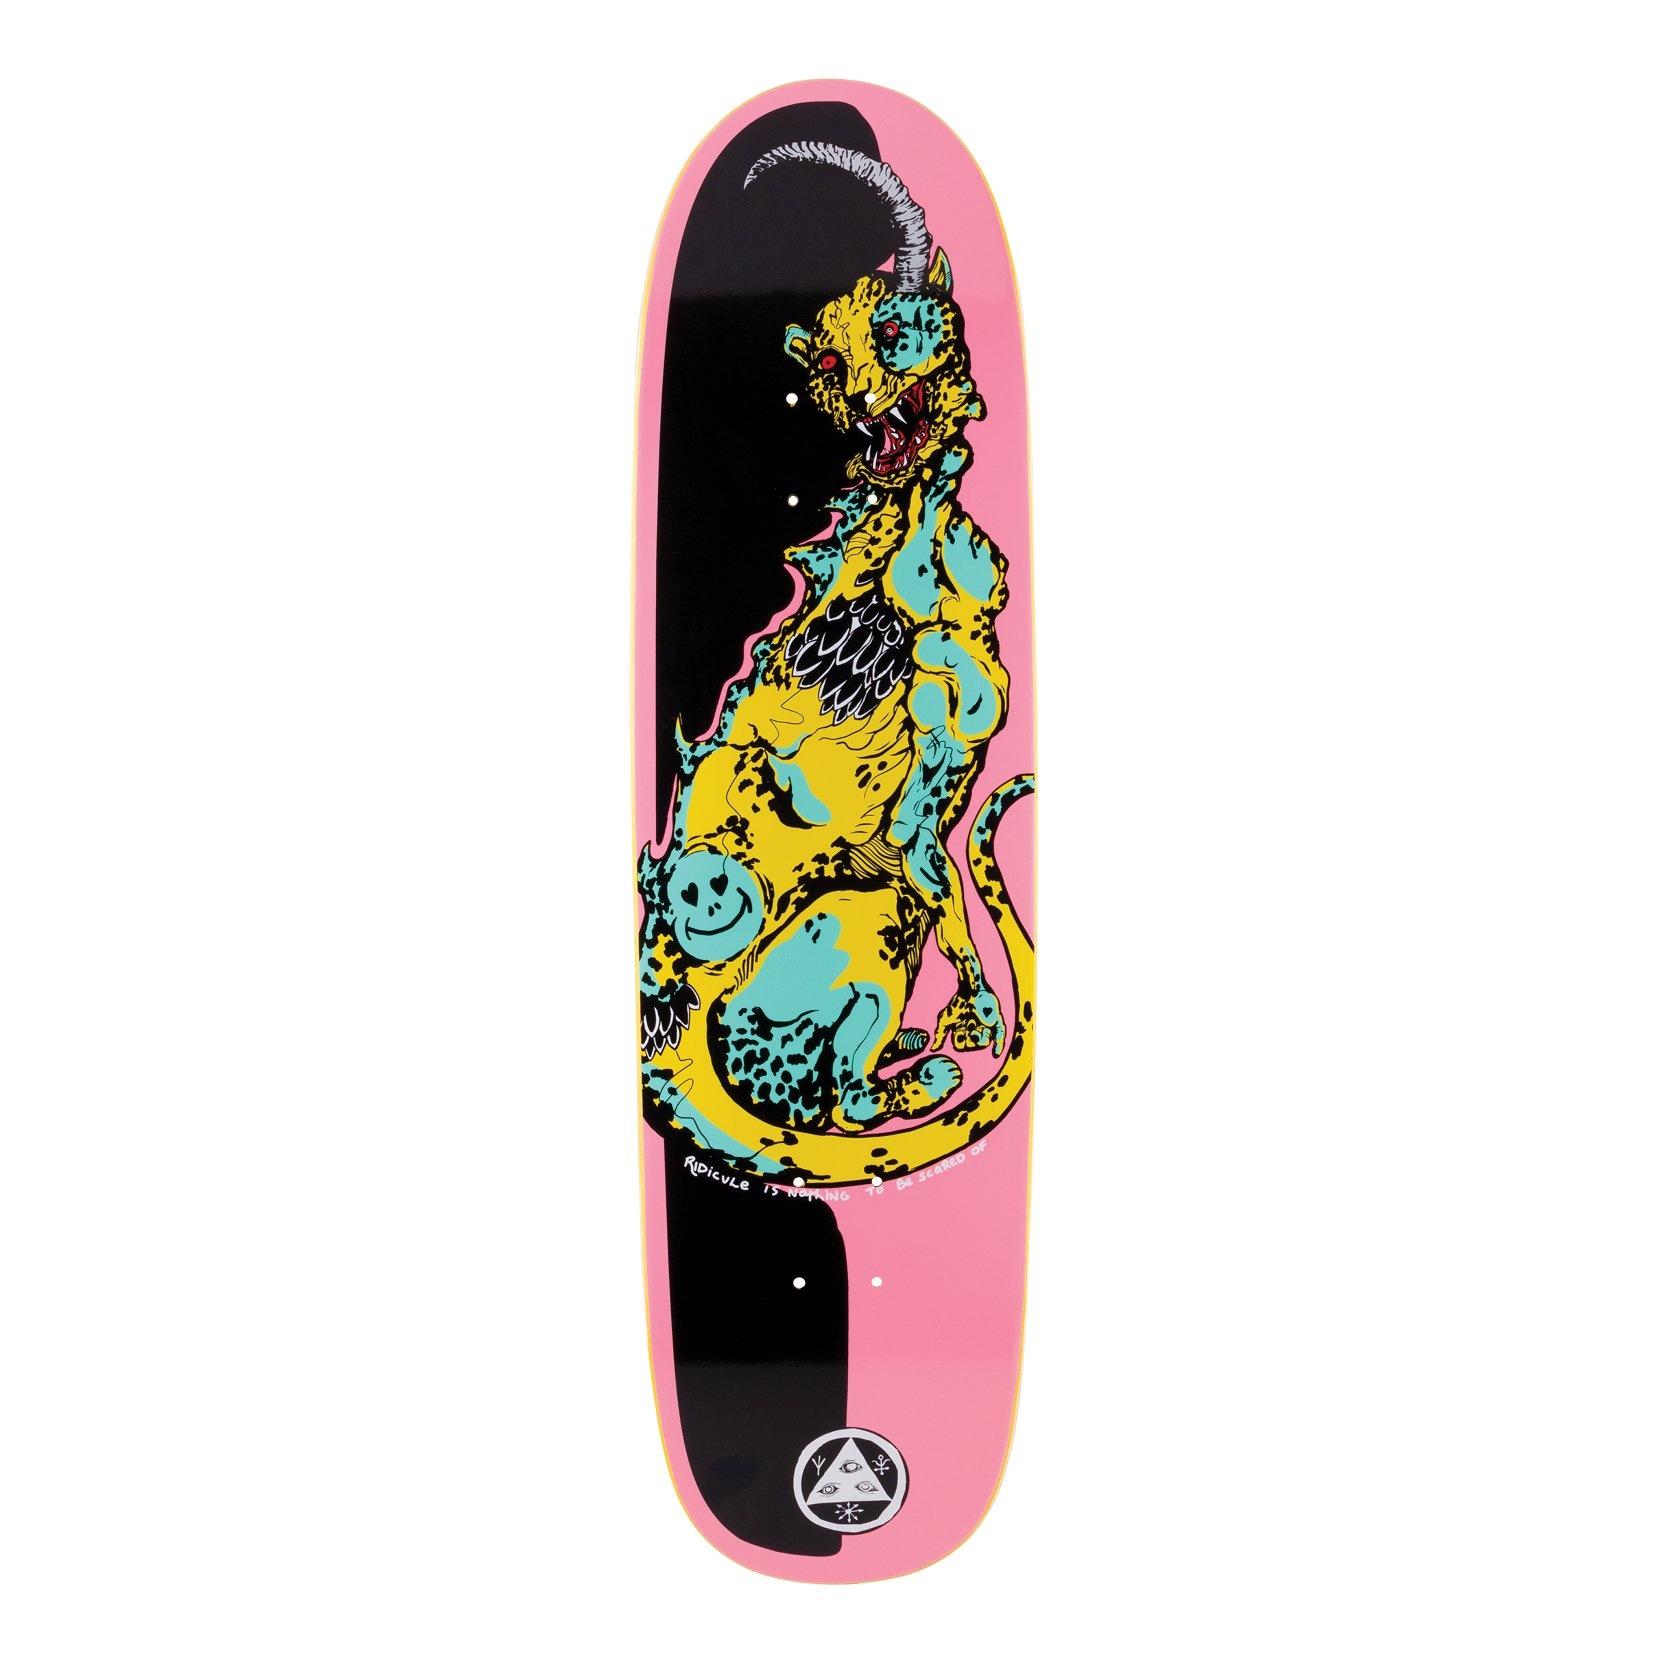 "Cheetah on Slyphstick - Pink/Black - 8.5"""